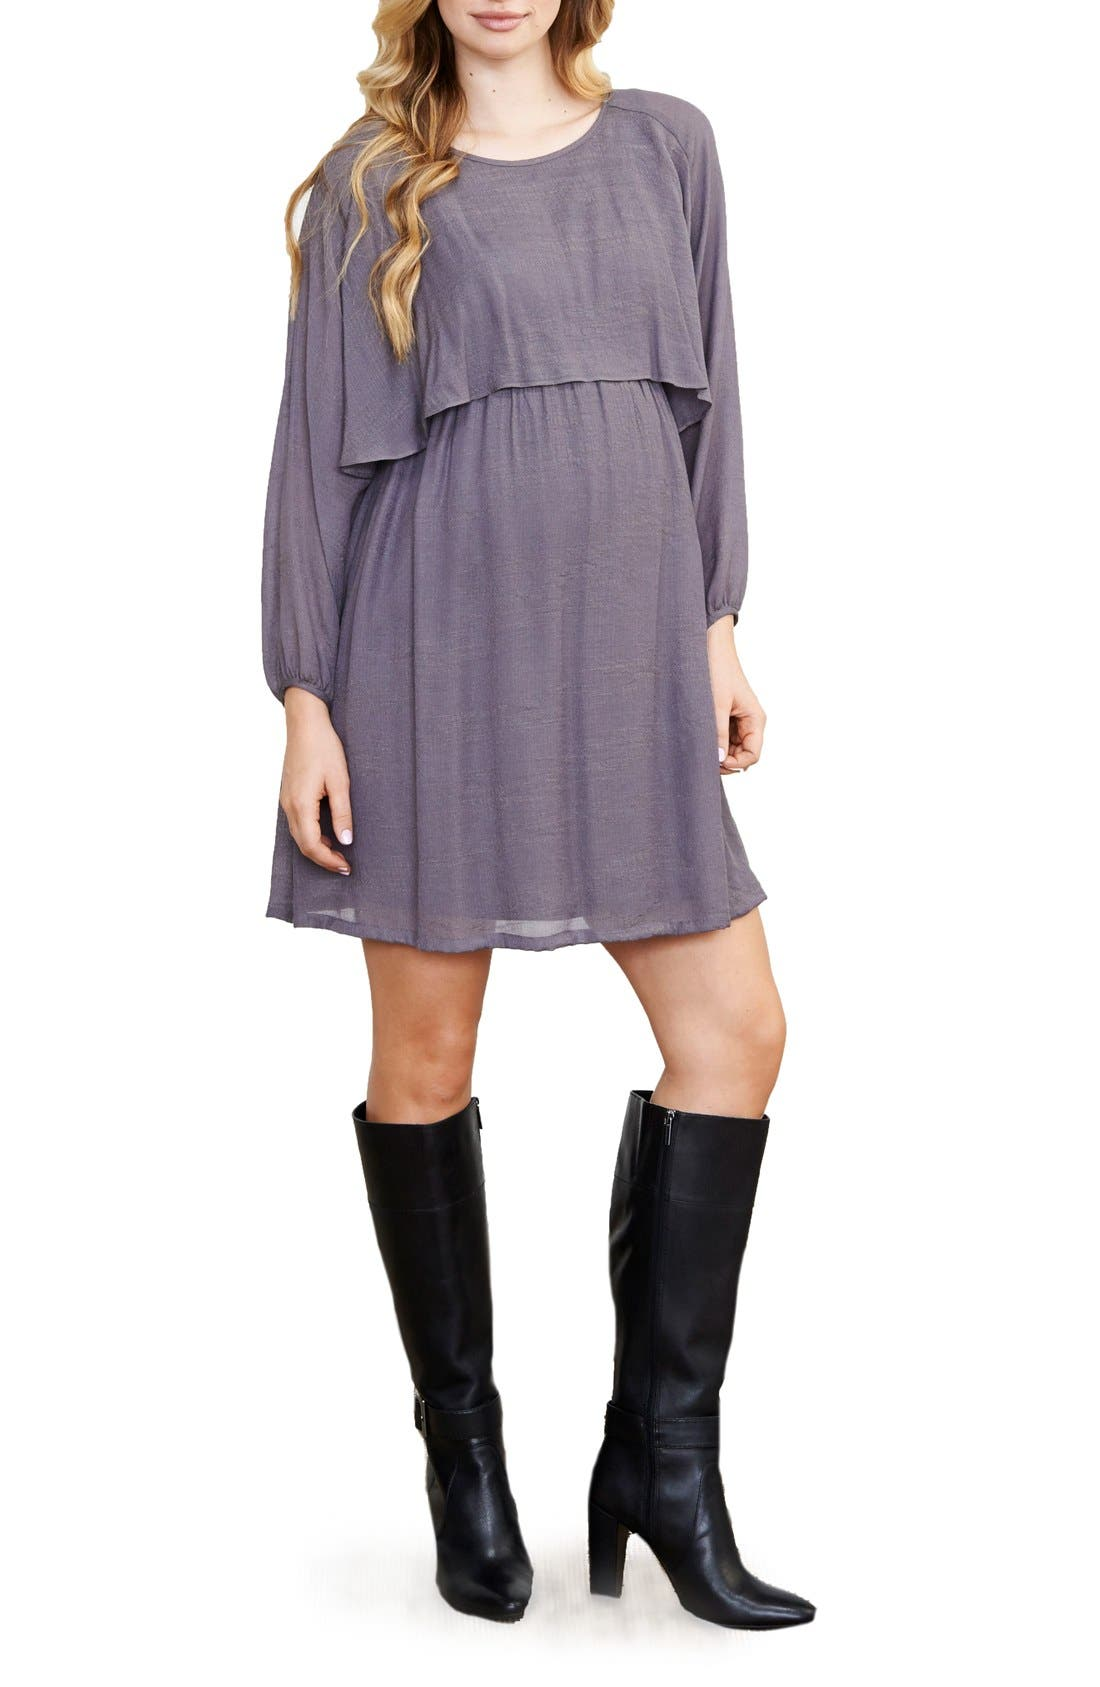 Blouson Maternity/Nursing Dress,                         Main,                         color, 020